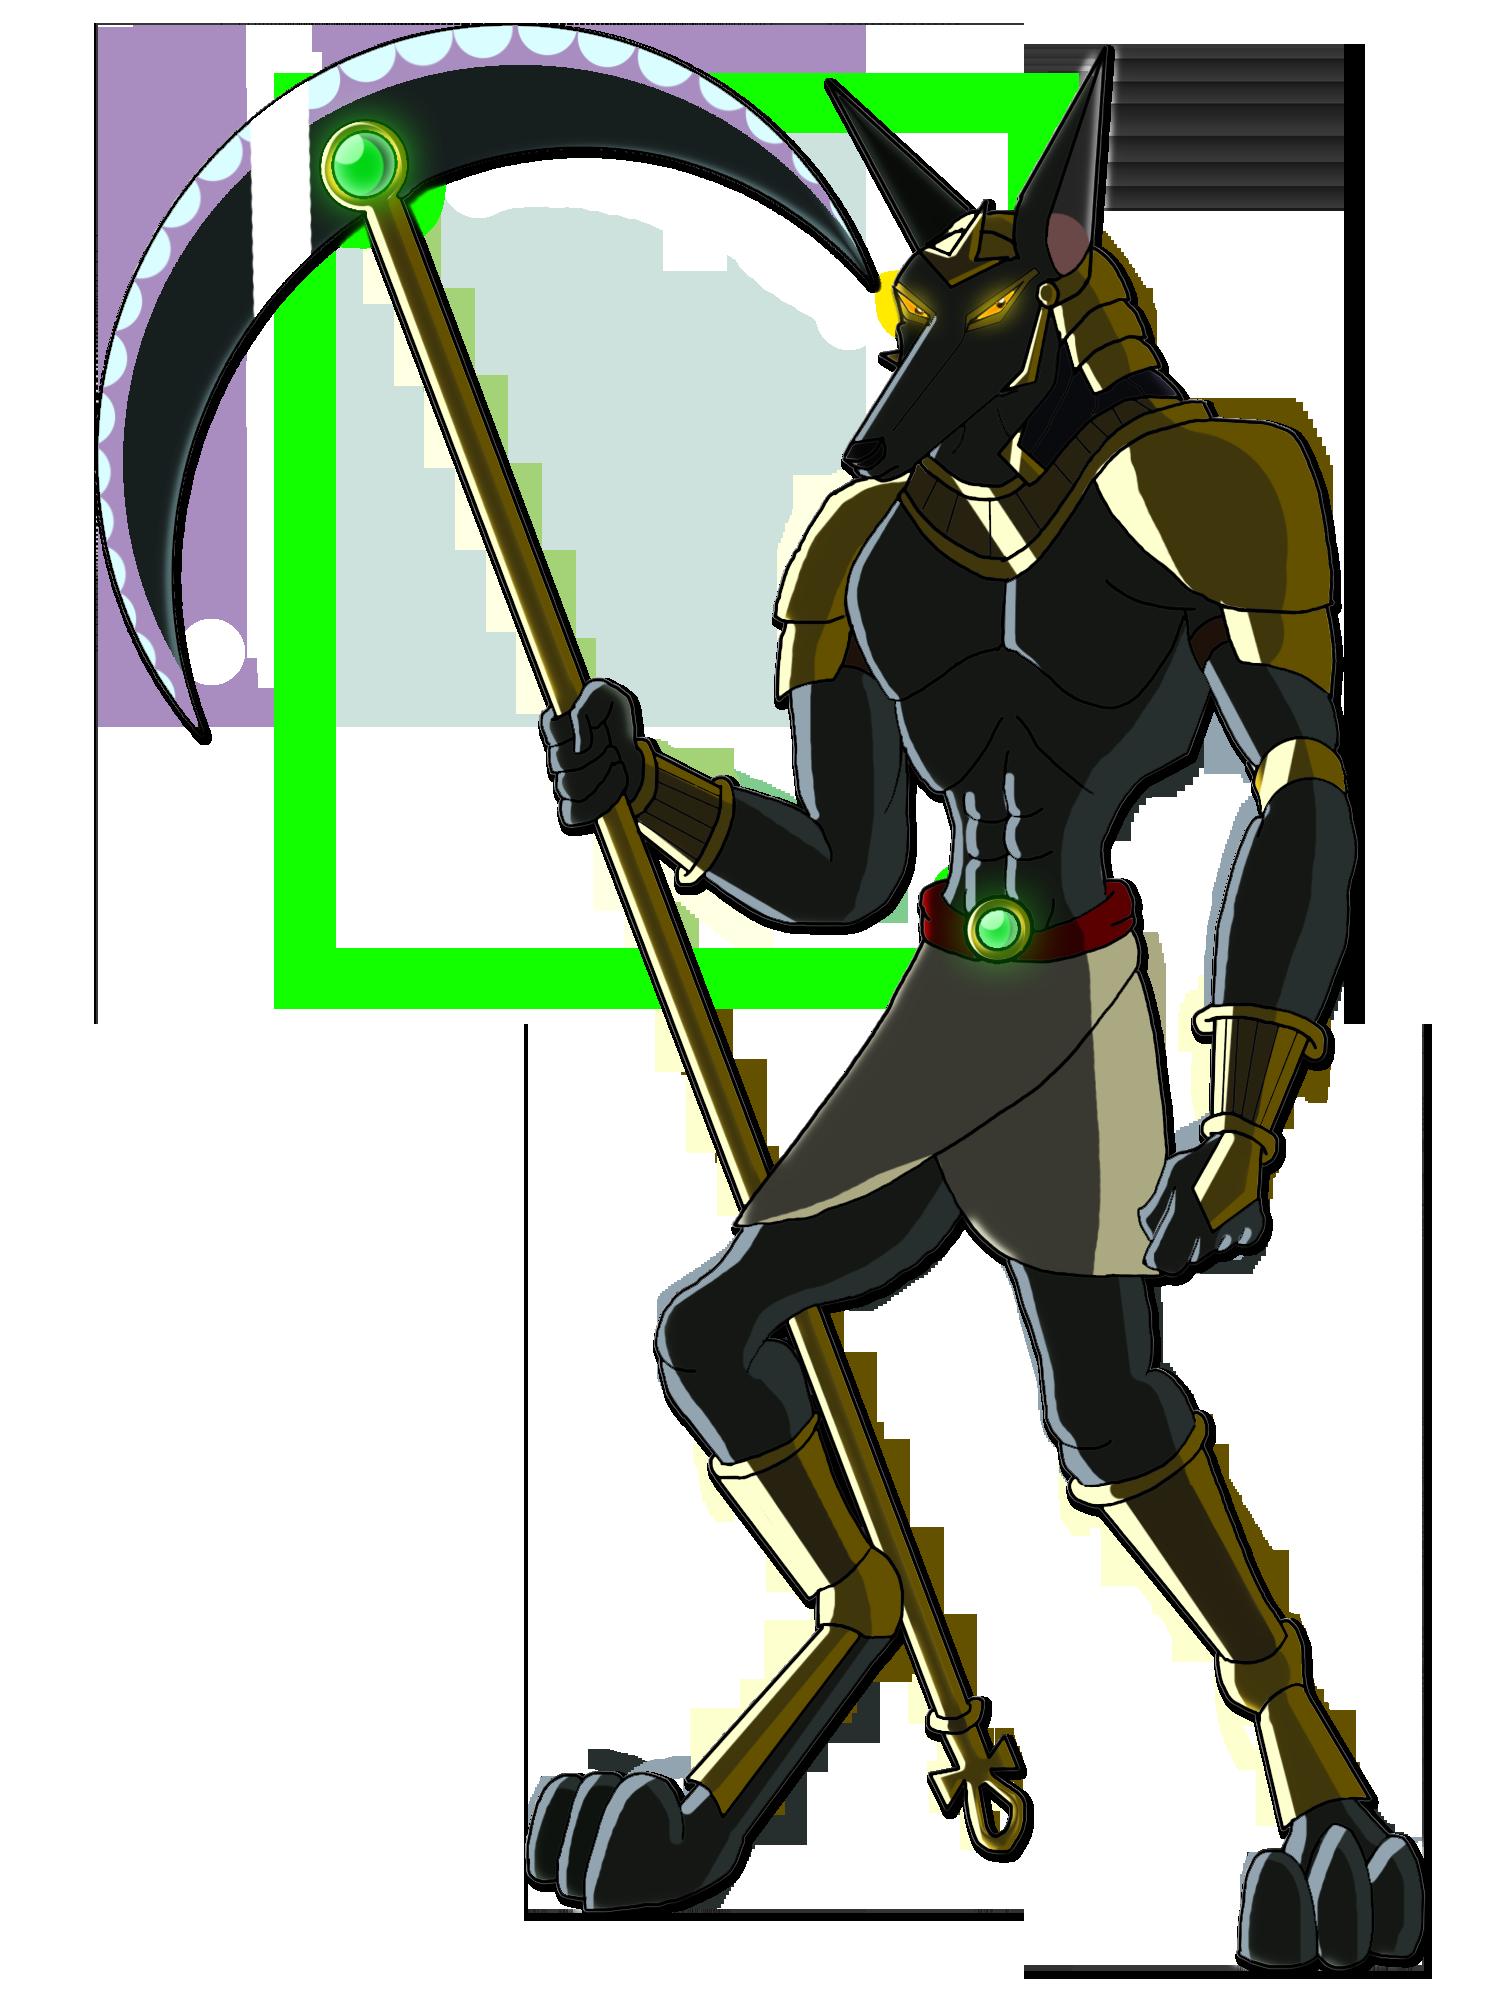 Egyptian Gods - Anubis by Moheart7 on DeviantArt